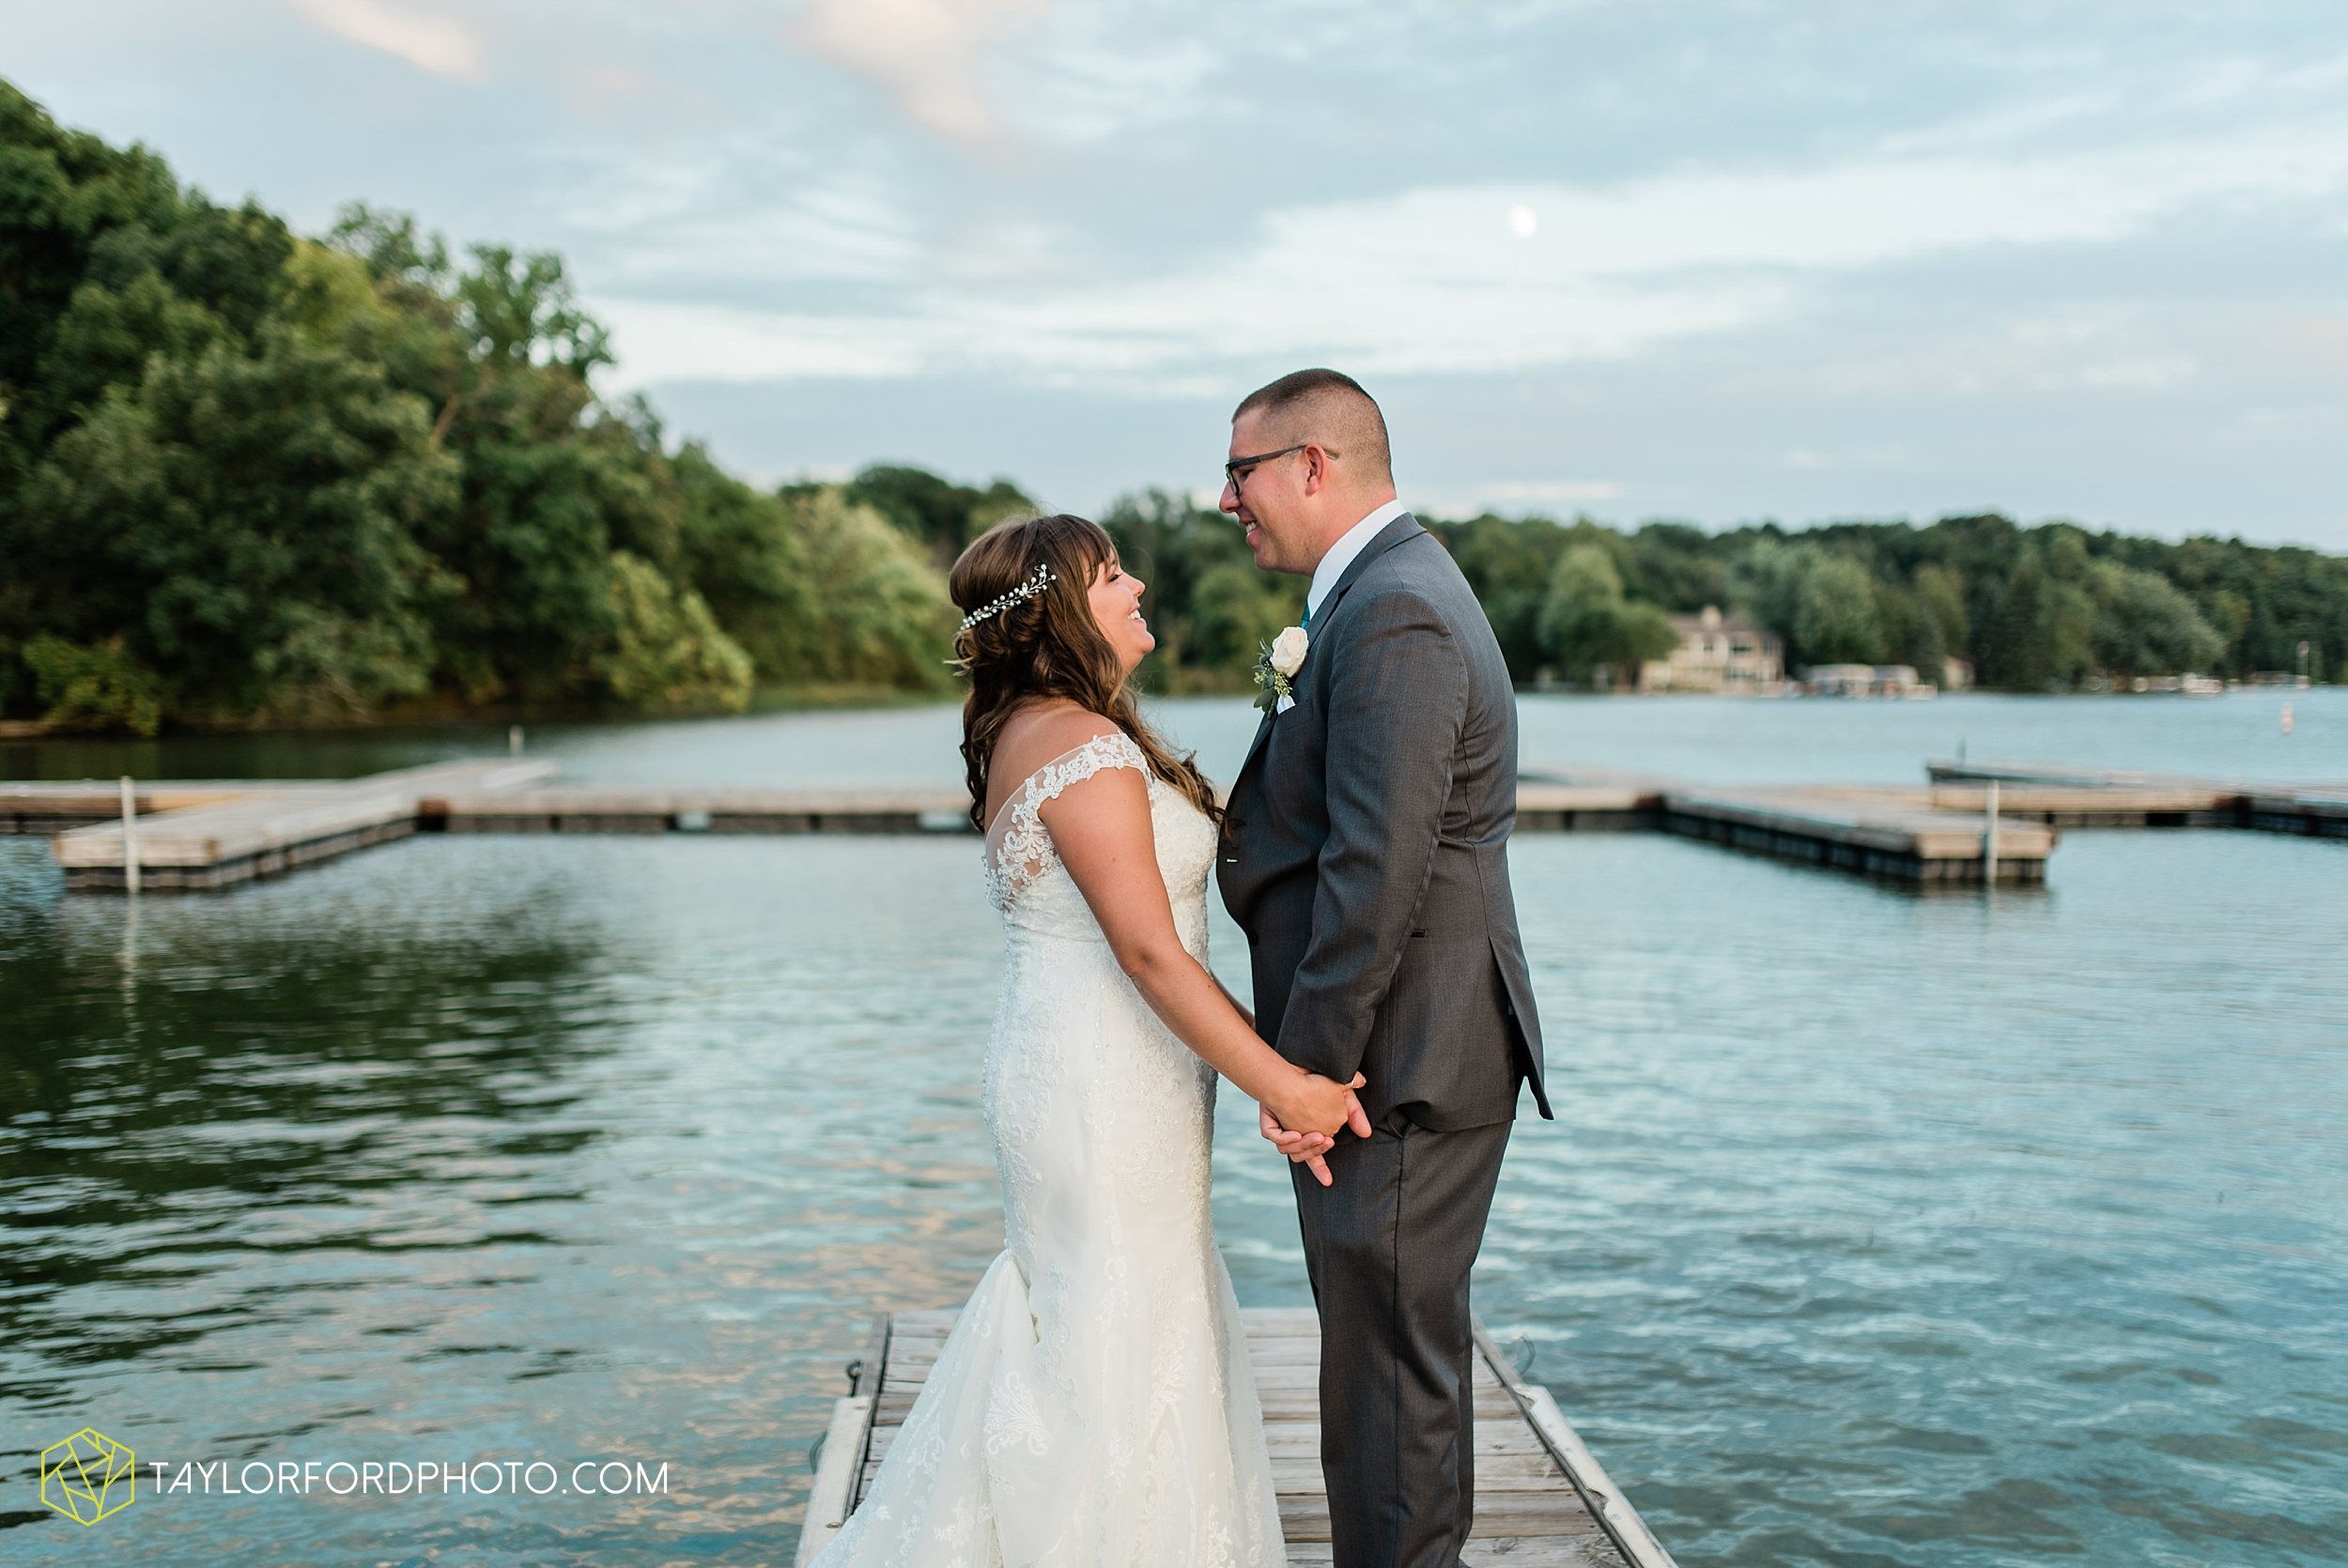 brook-loren-pokagon-state-park-angola-indiana-potowatomi-inn-wedding-fall-lake-james-photographer-taylor-ford-photography_0561.jpg